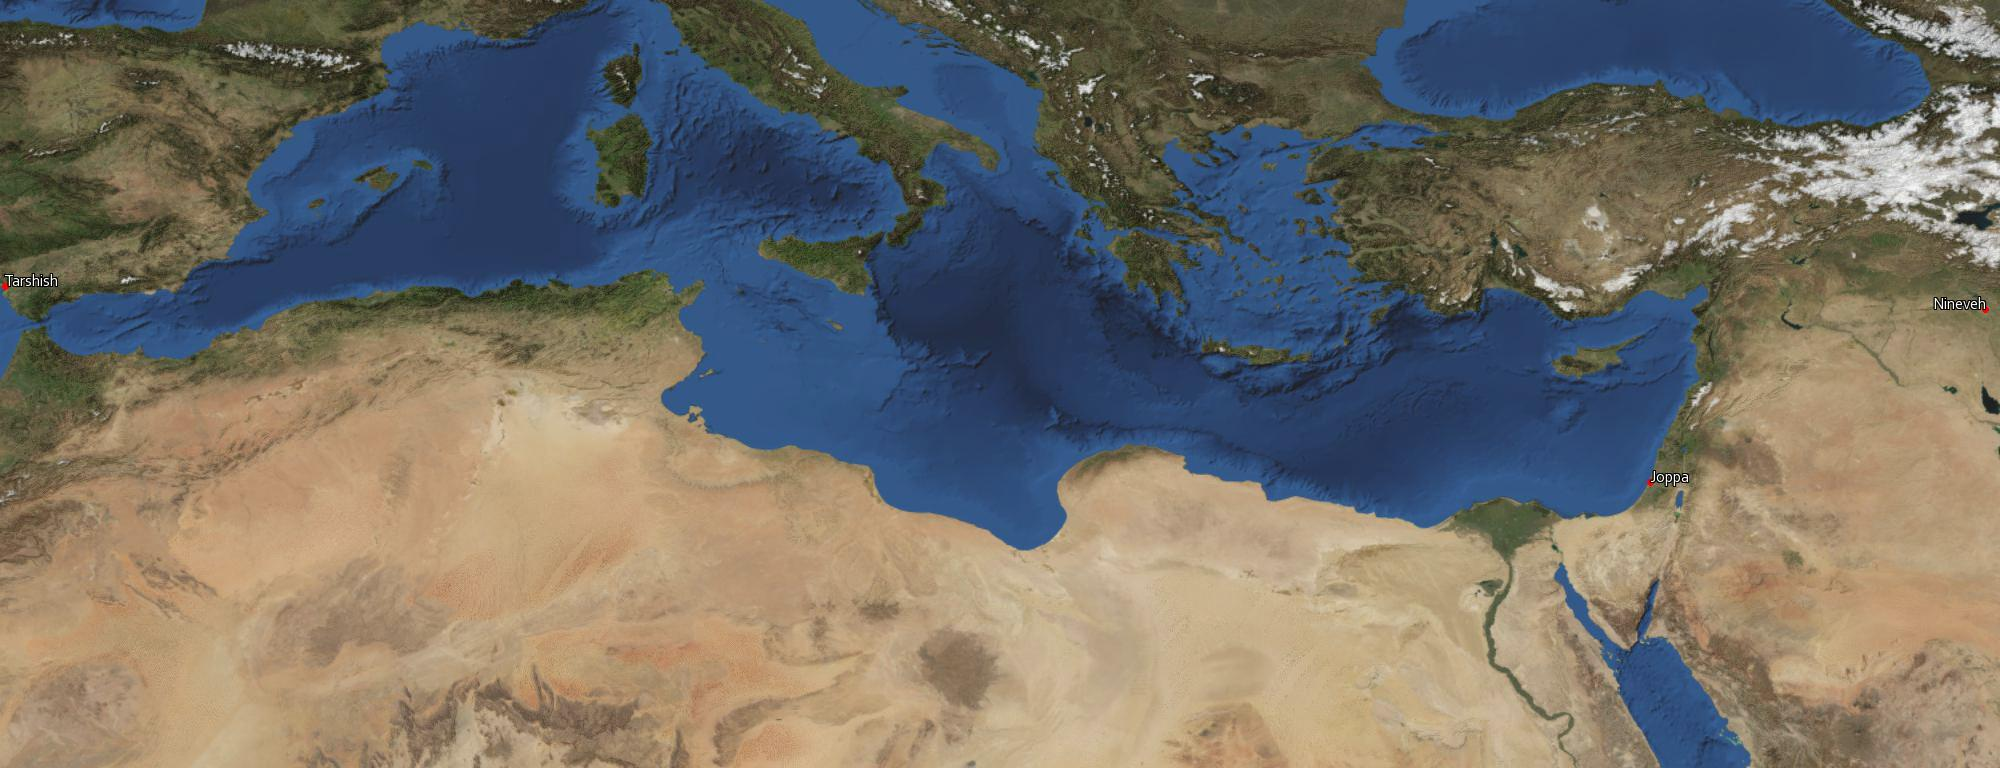 Jonah Geocoding